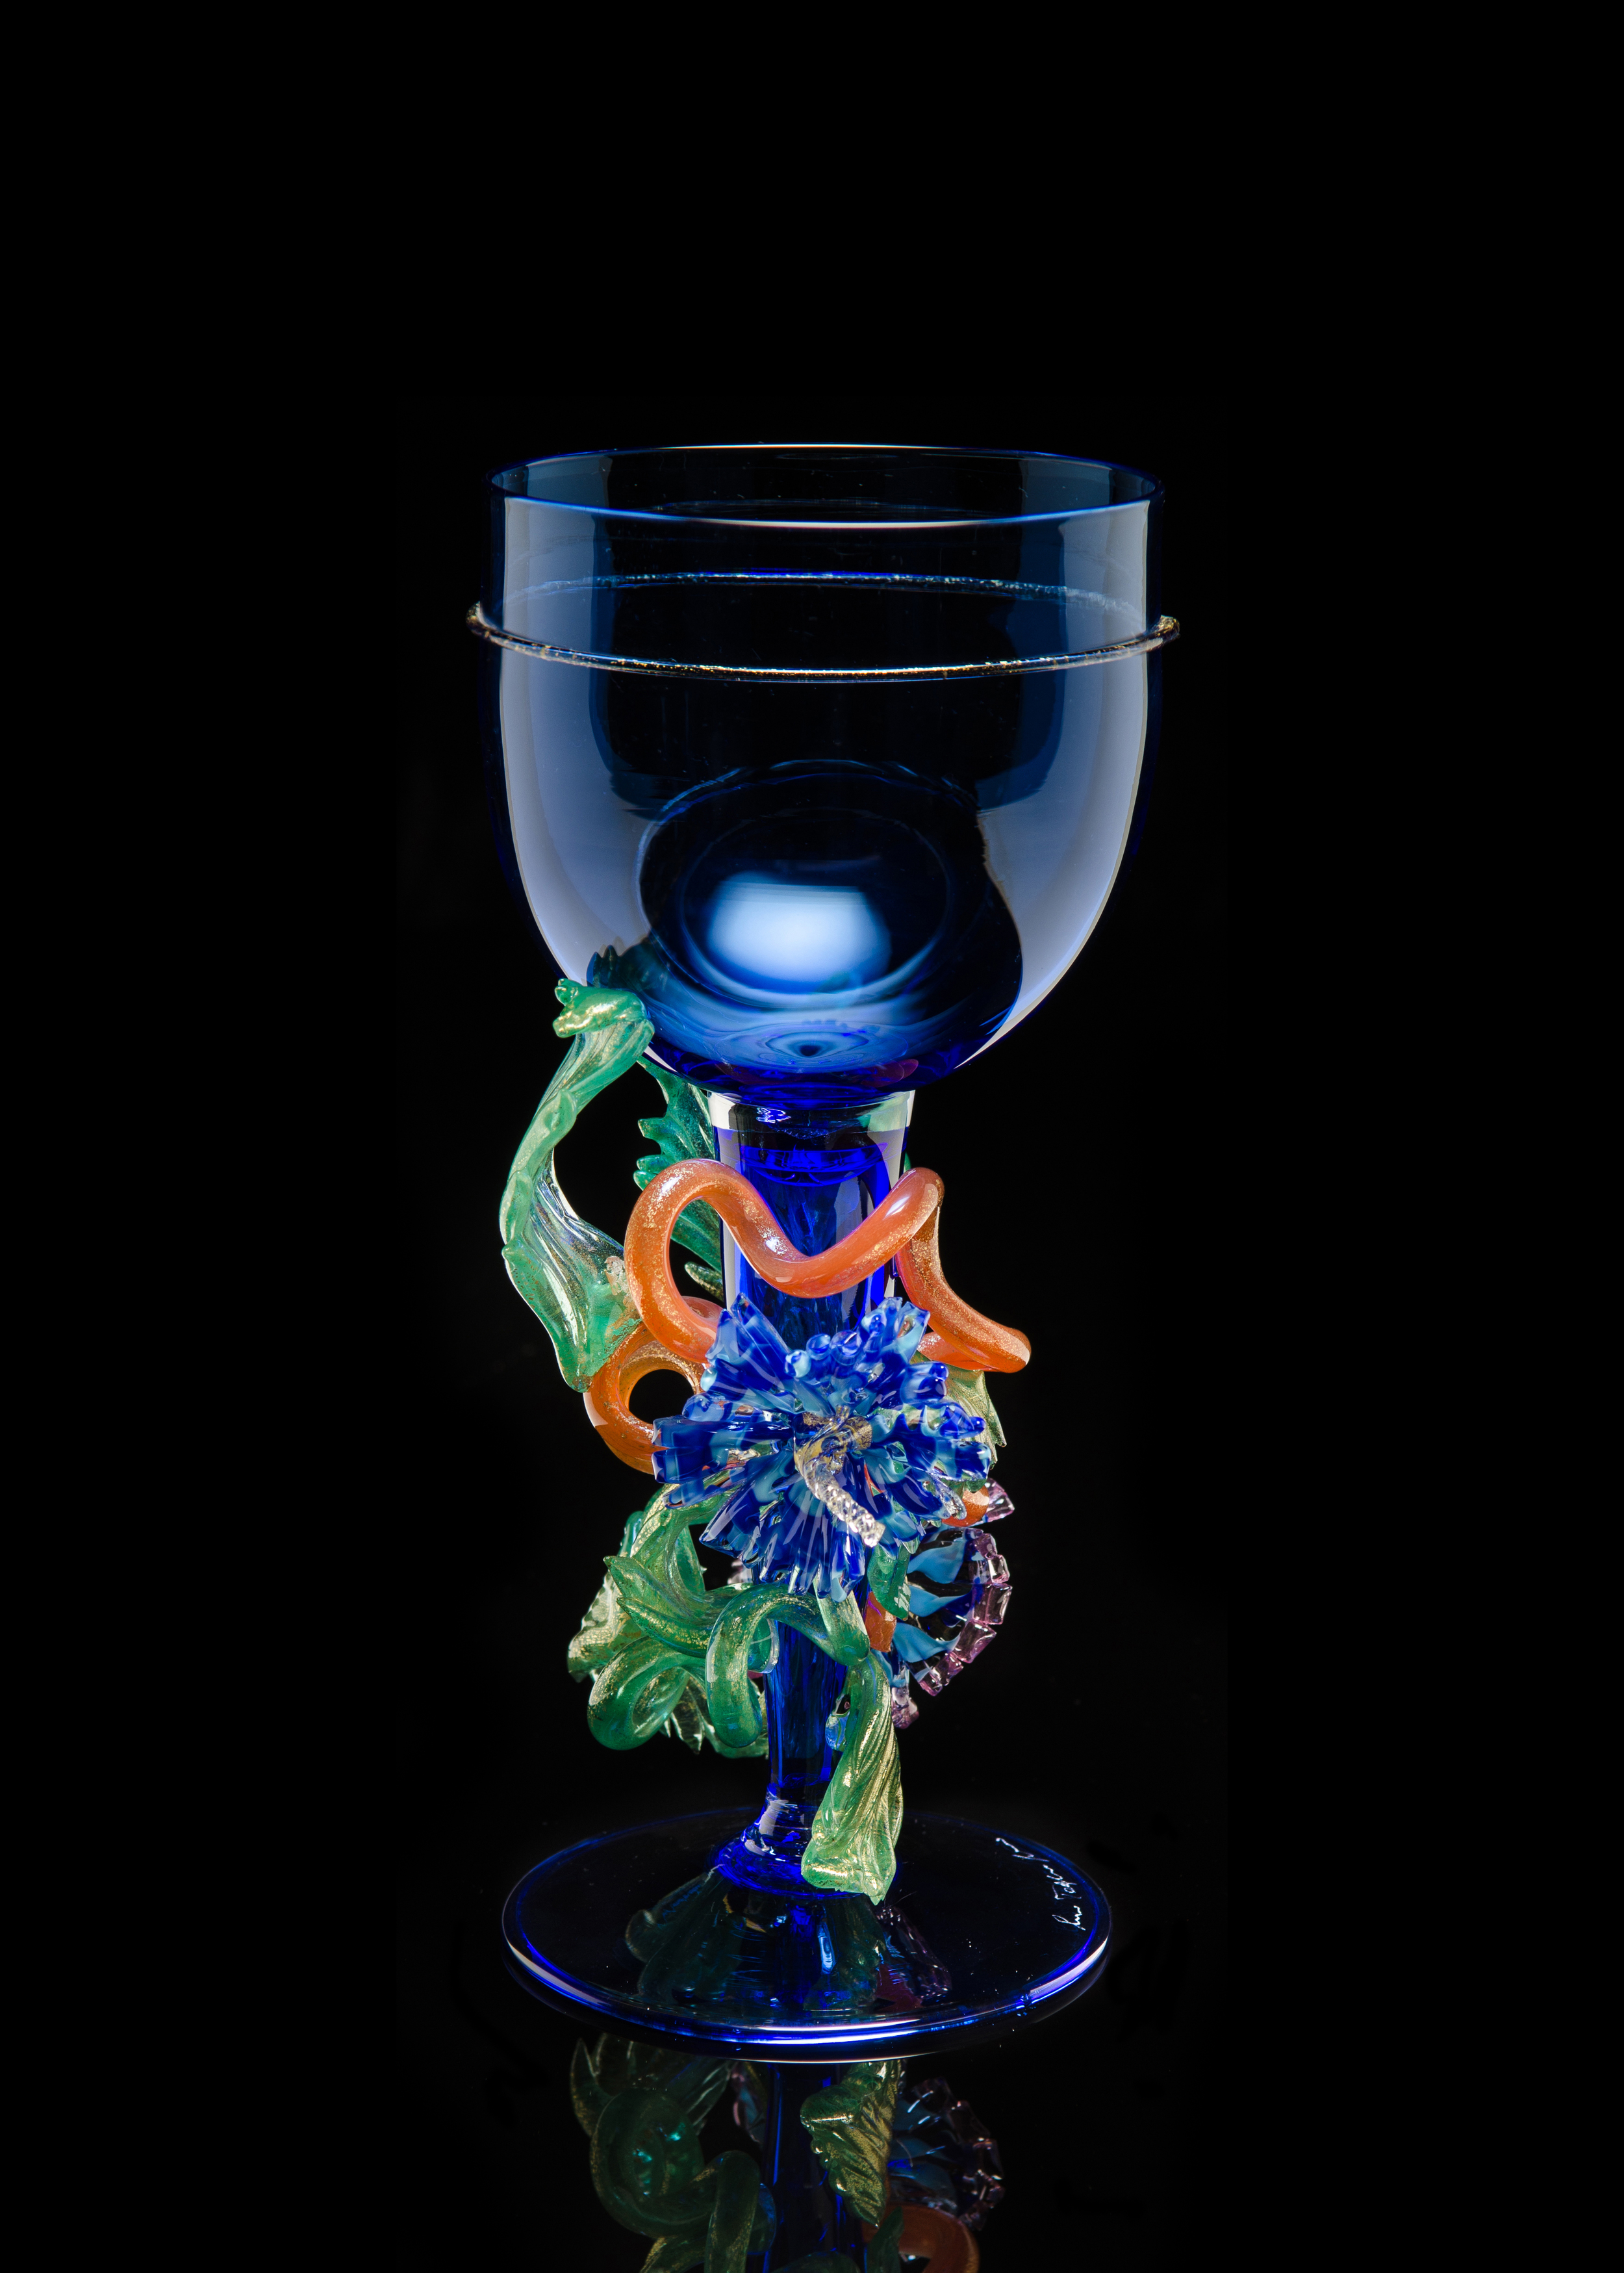 Lino Tagliapietra, Goblet, (1991-1994, glass, 9 1/4 x 4 1/4 x 4 1/4 inches), LT.39